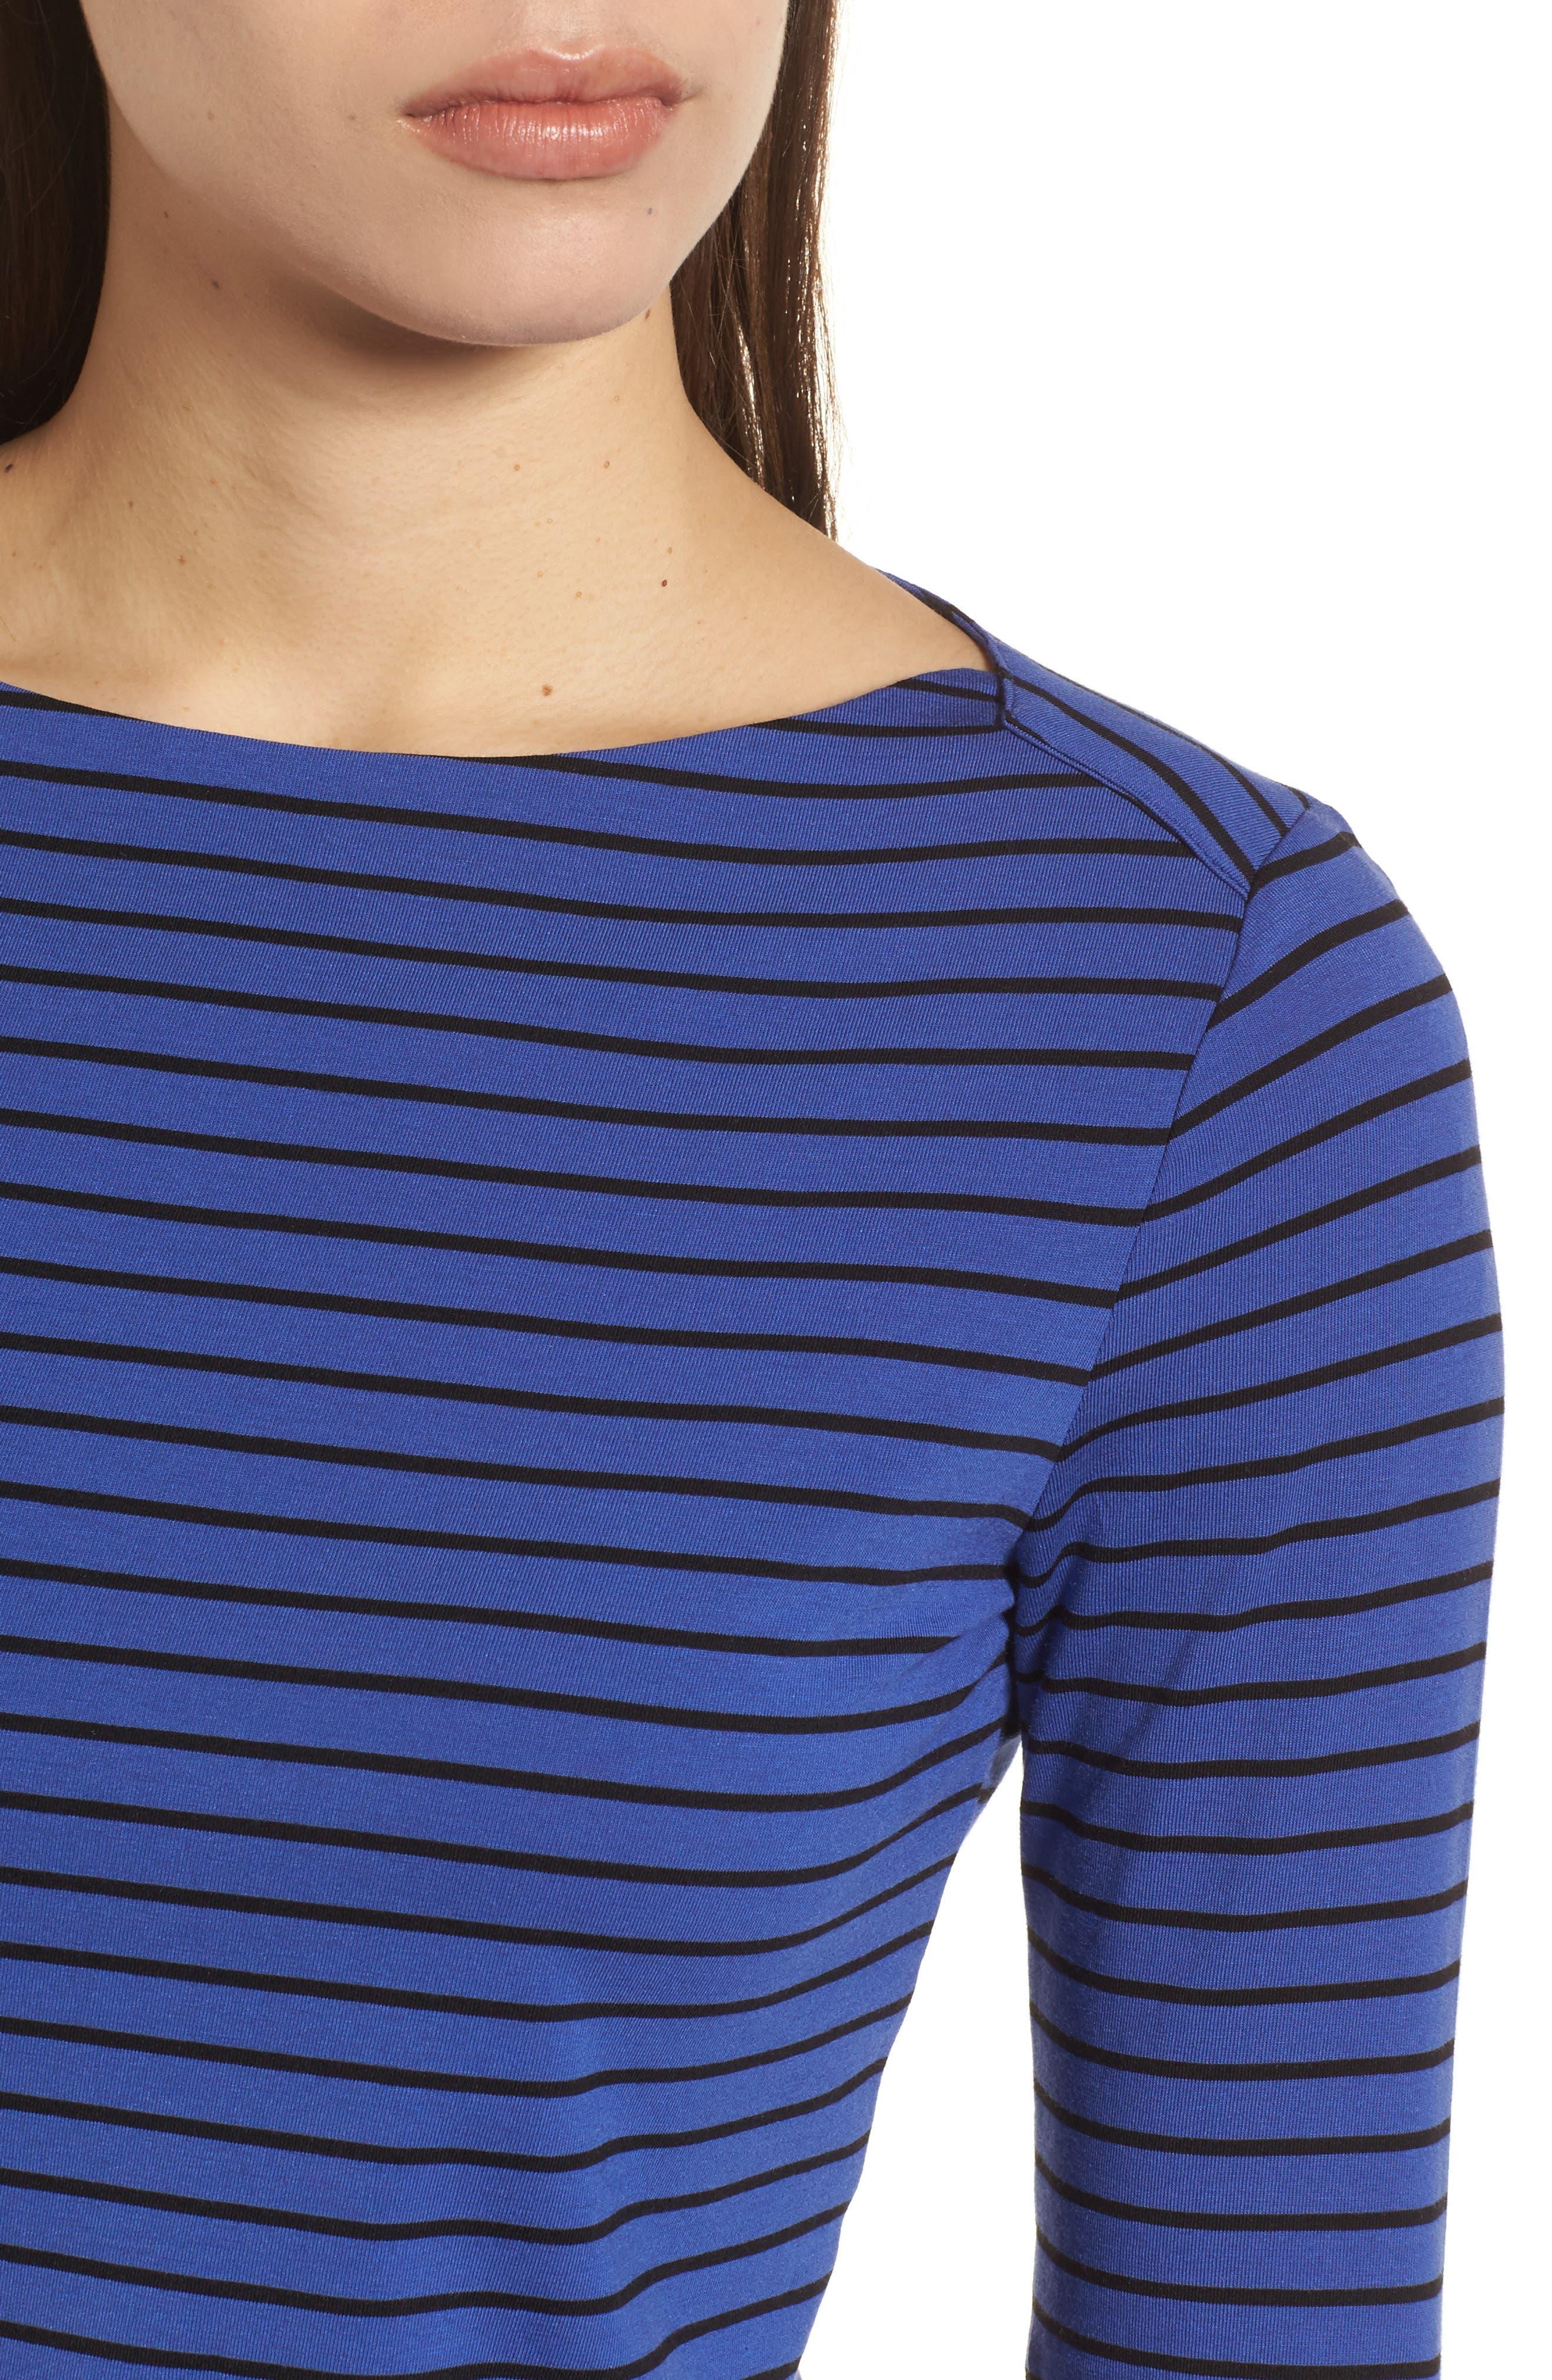 Stripe Knit Boatneck Top,                             Alternate thumbnail 4, color,                             Okeeffe Blue/ Black